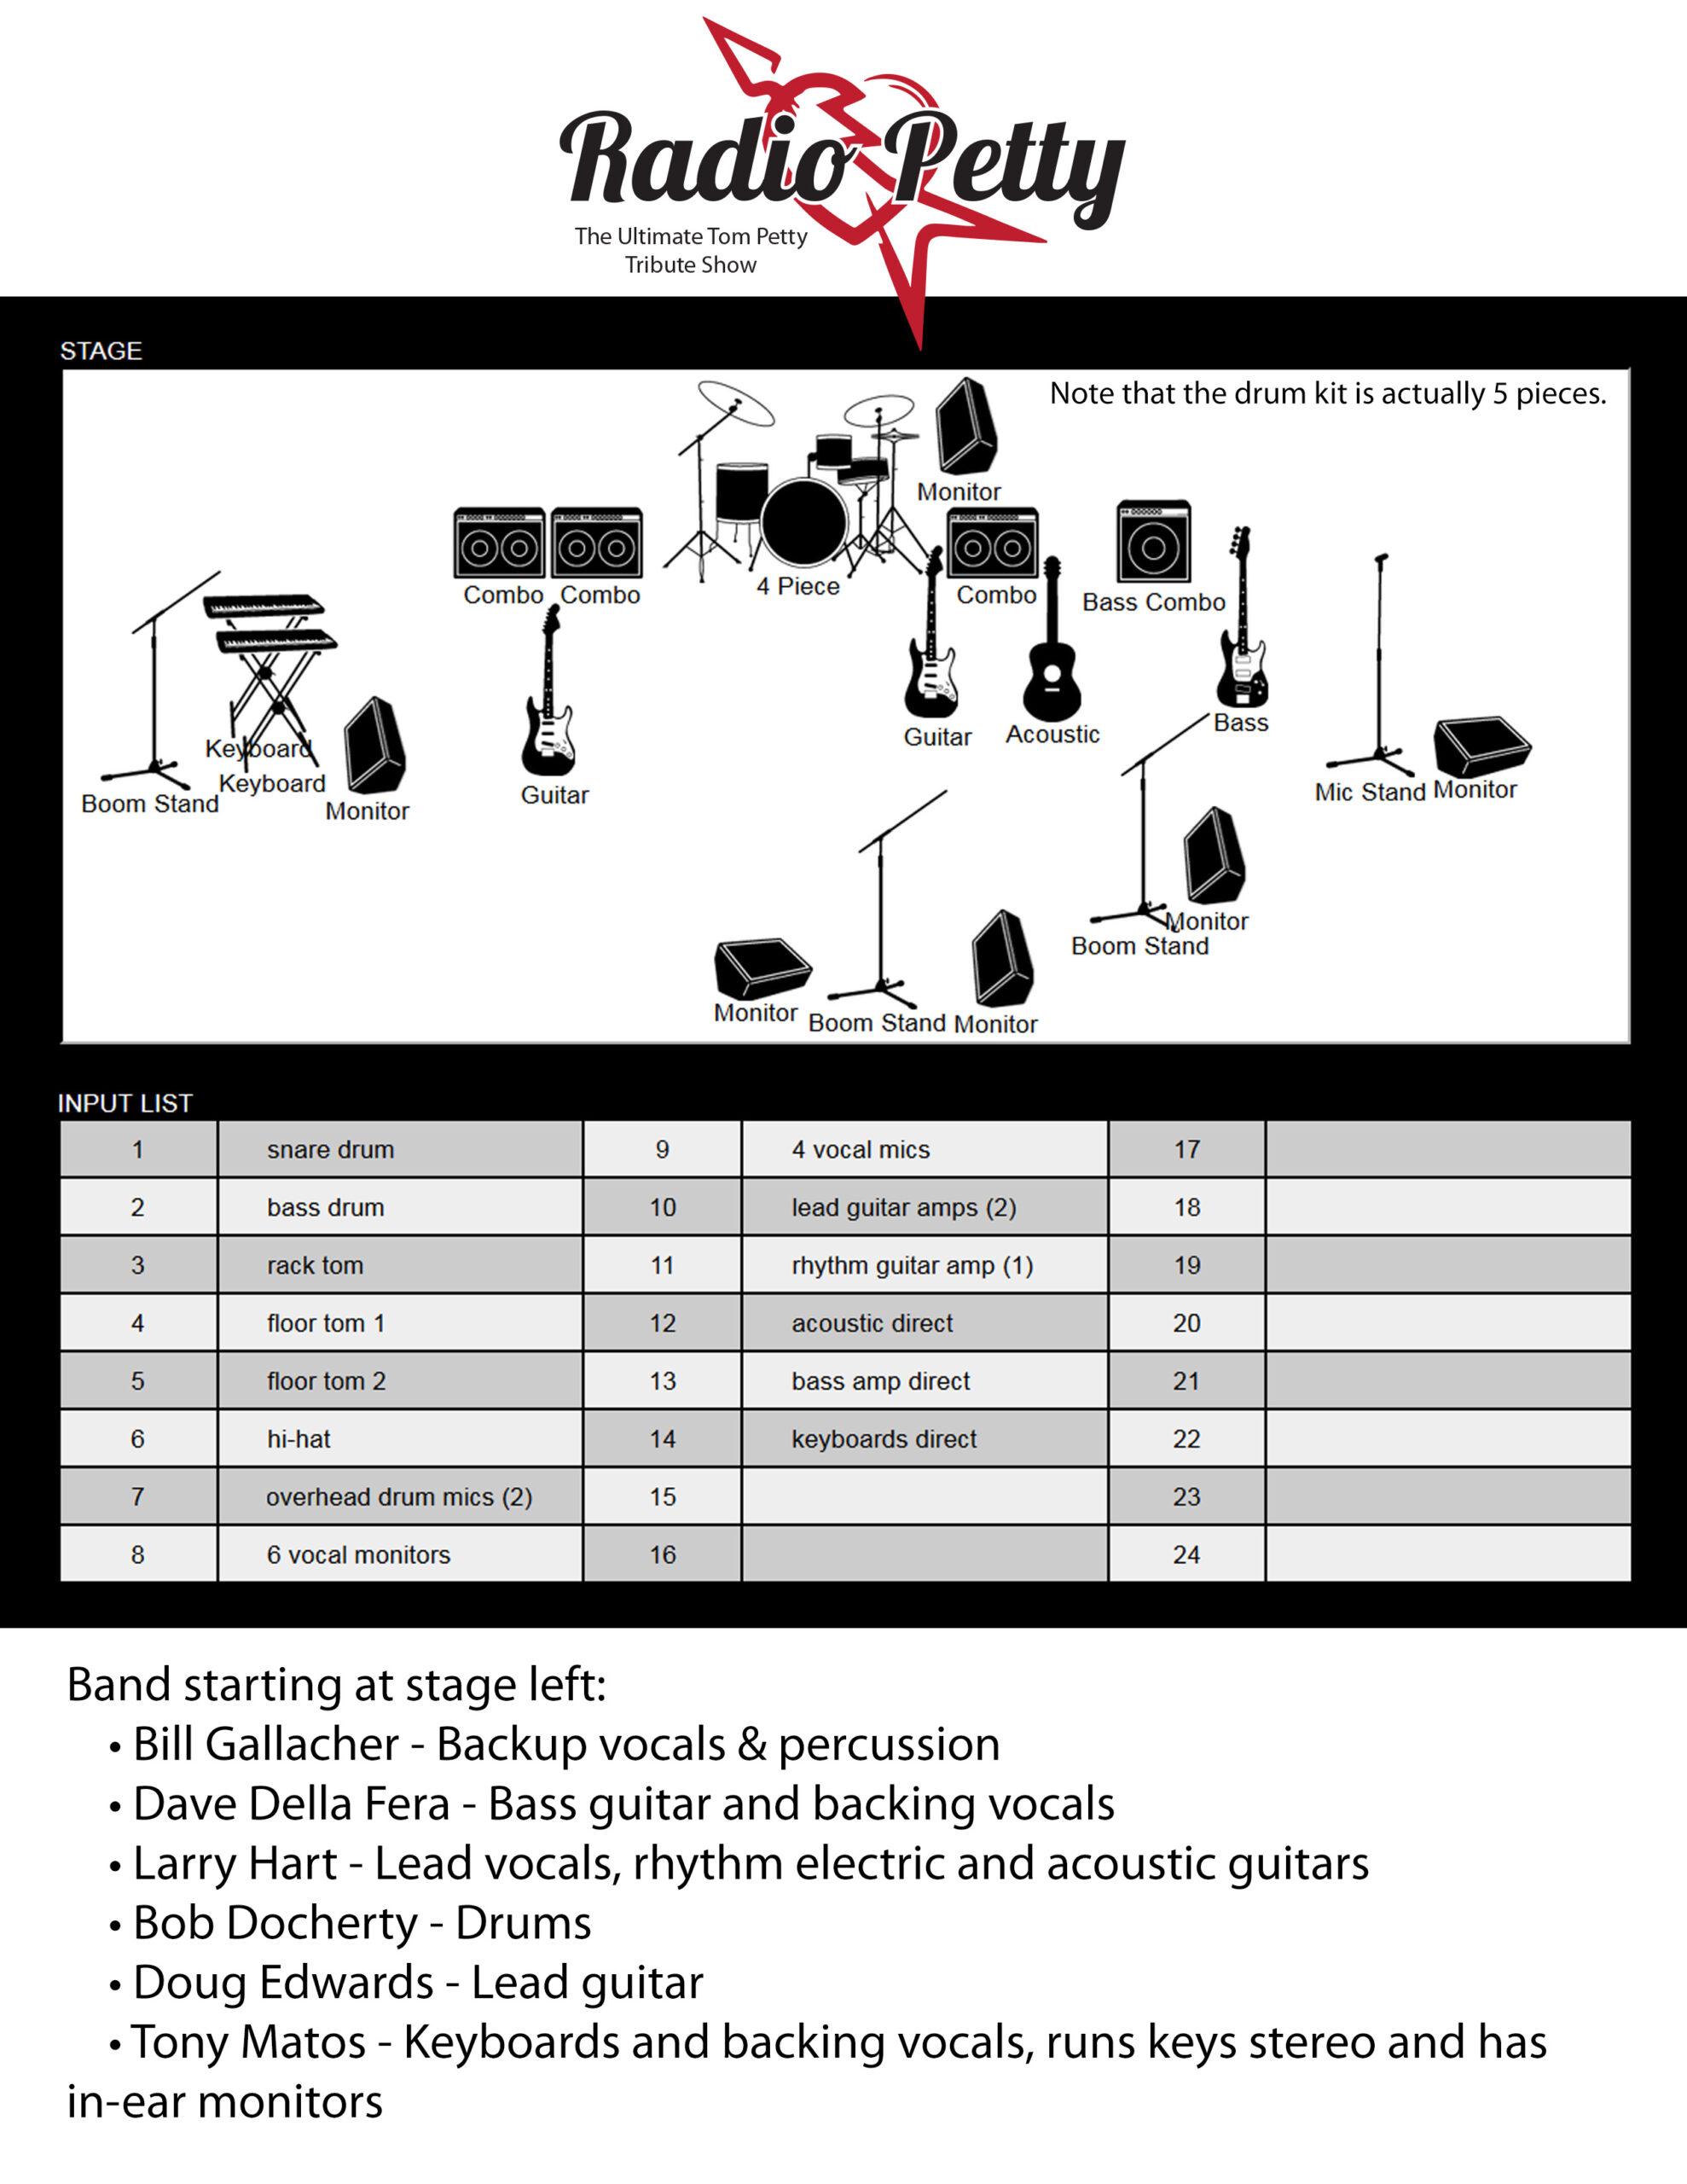 RadioPetty-Stage-Plot